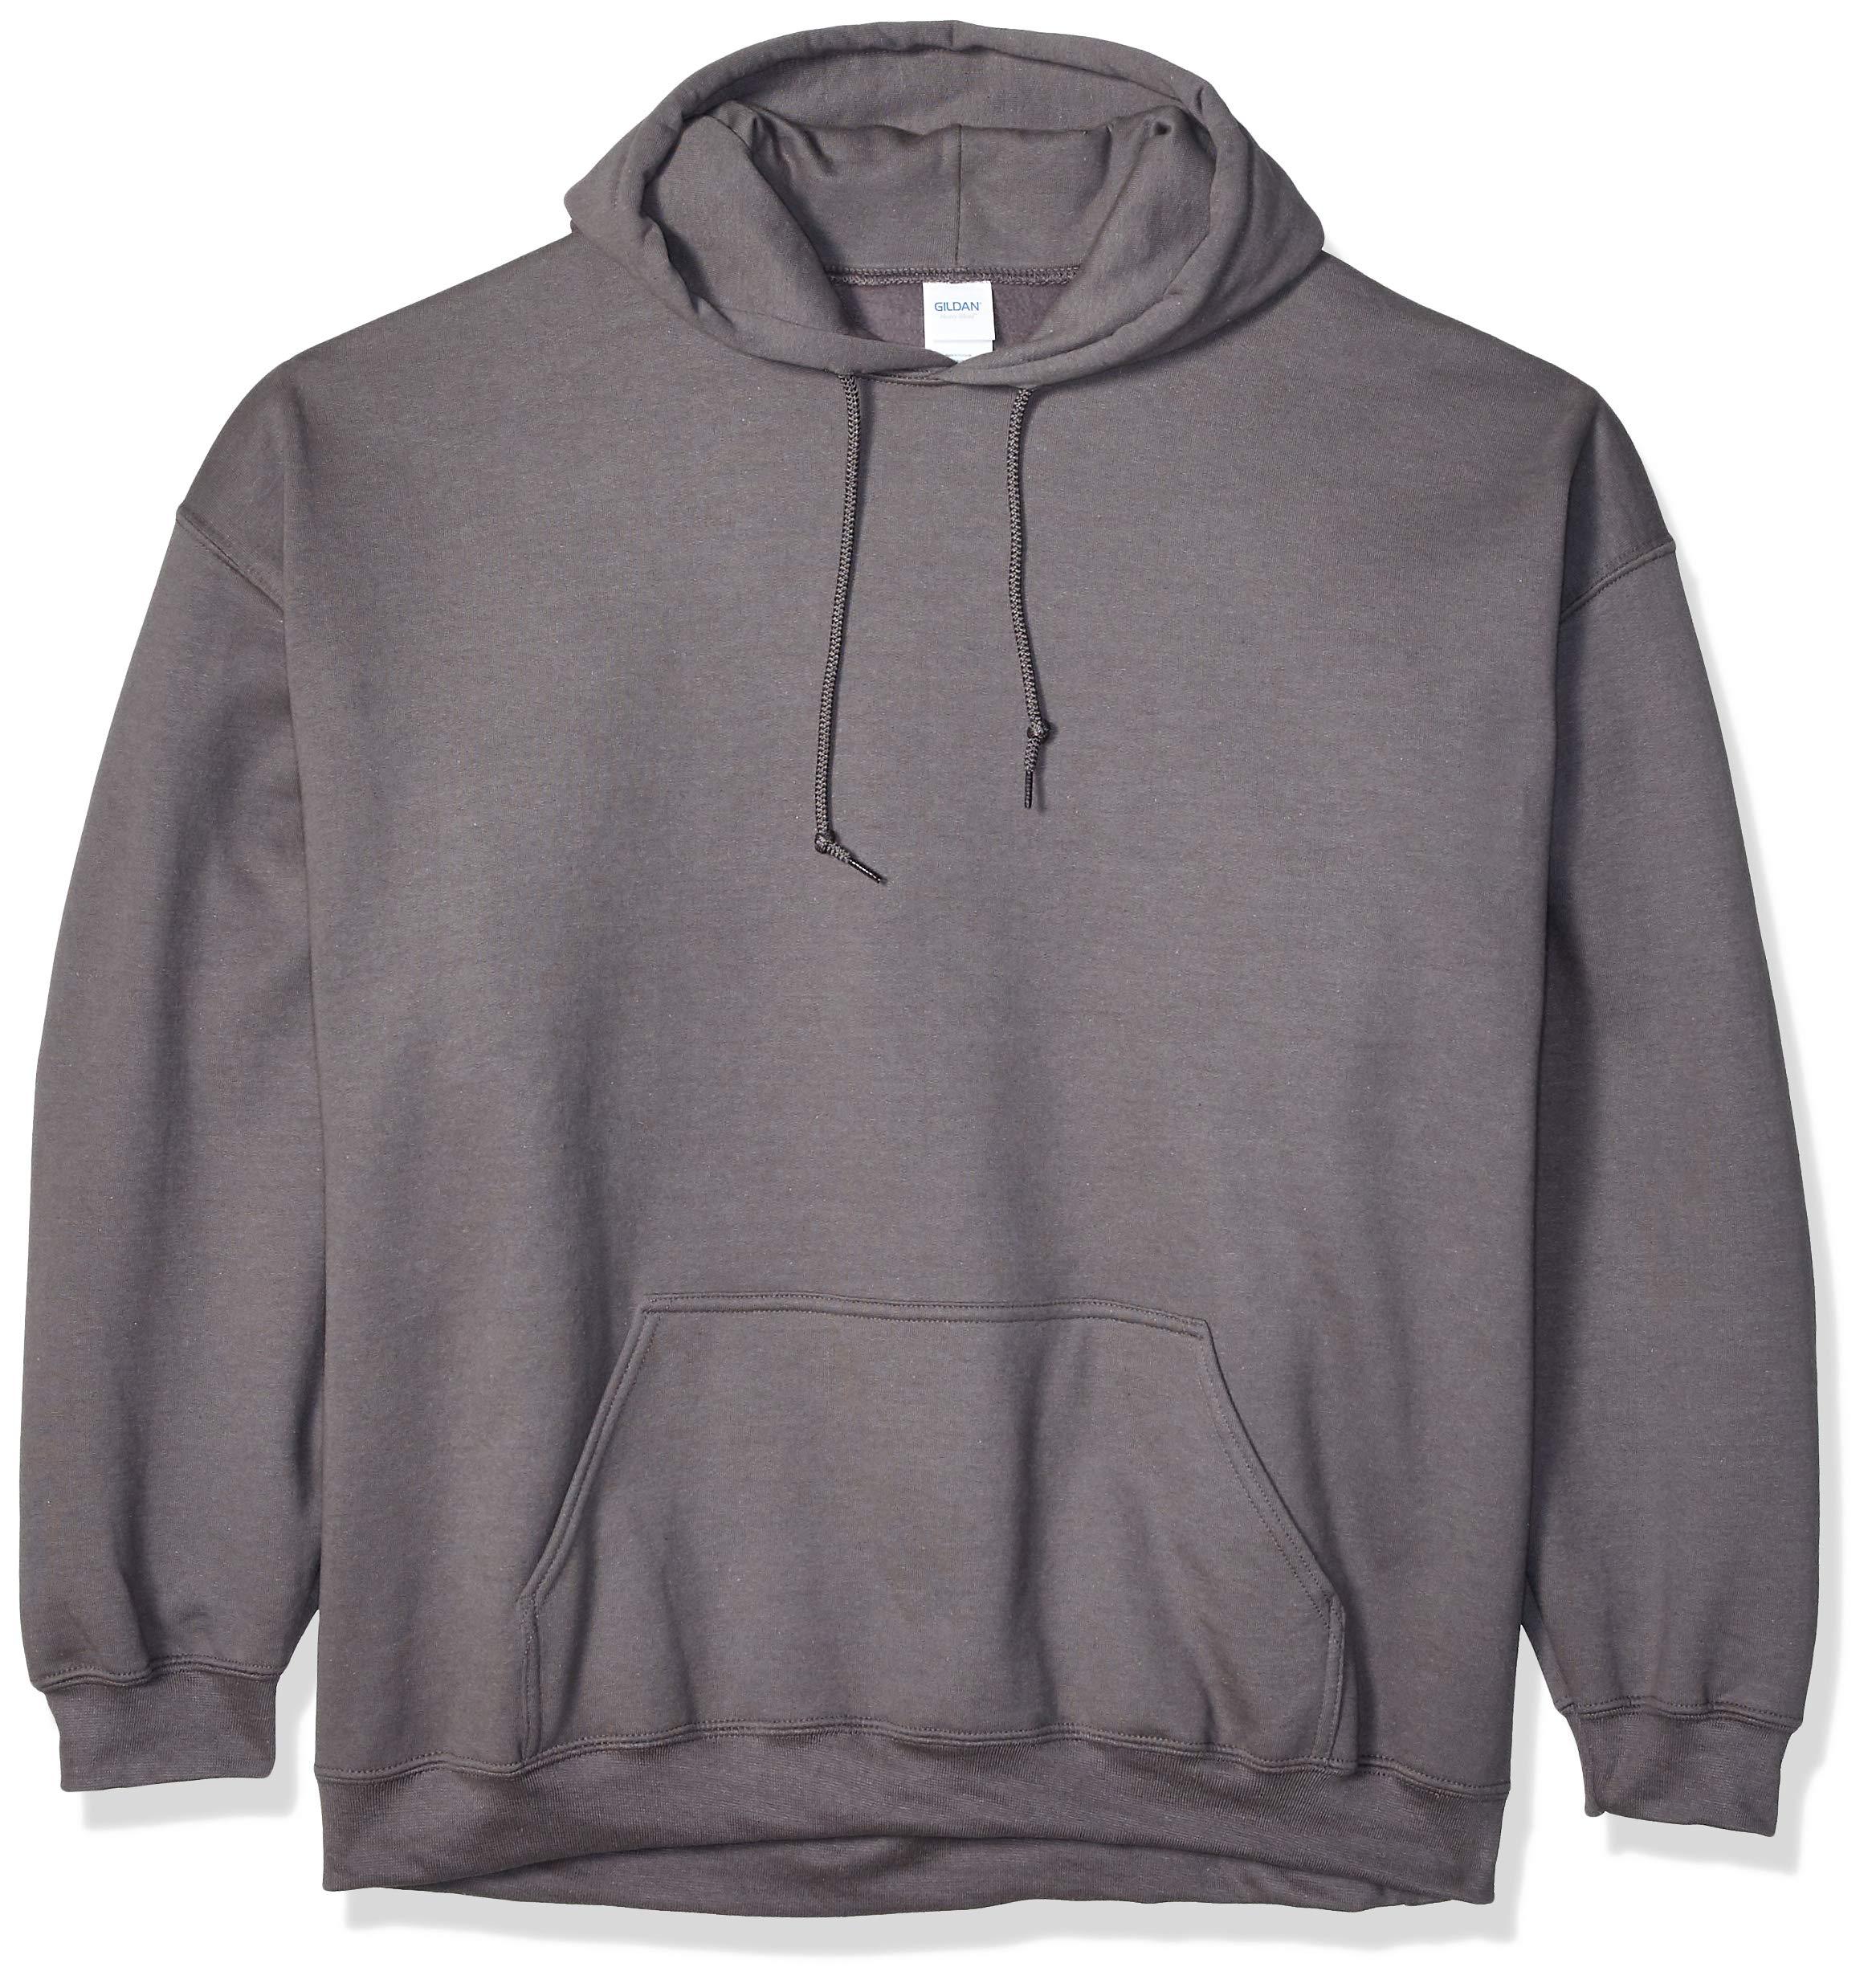 Gildan Men's Heavy Blend Fleece Hooded Sweatshirt G18500, Charcoal, Small